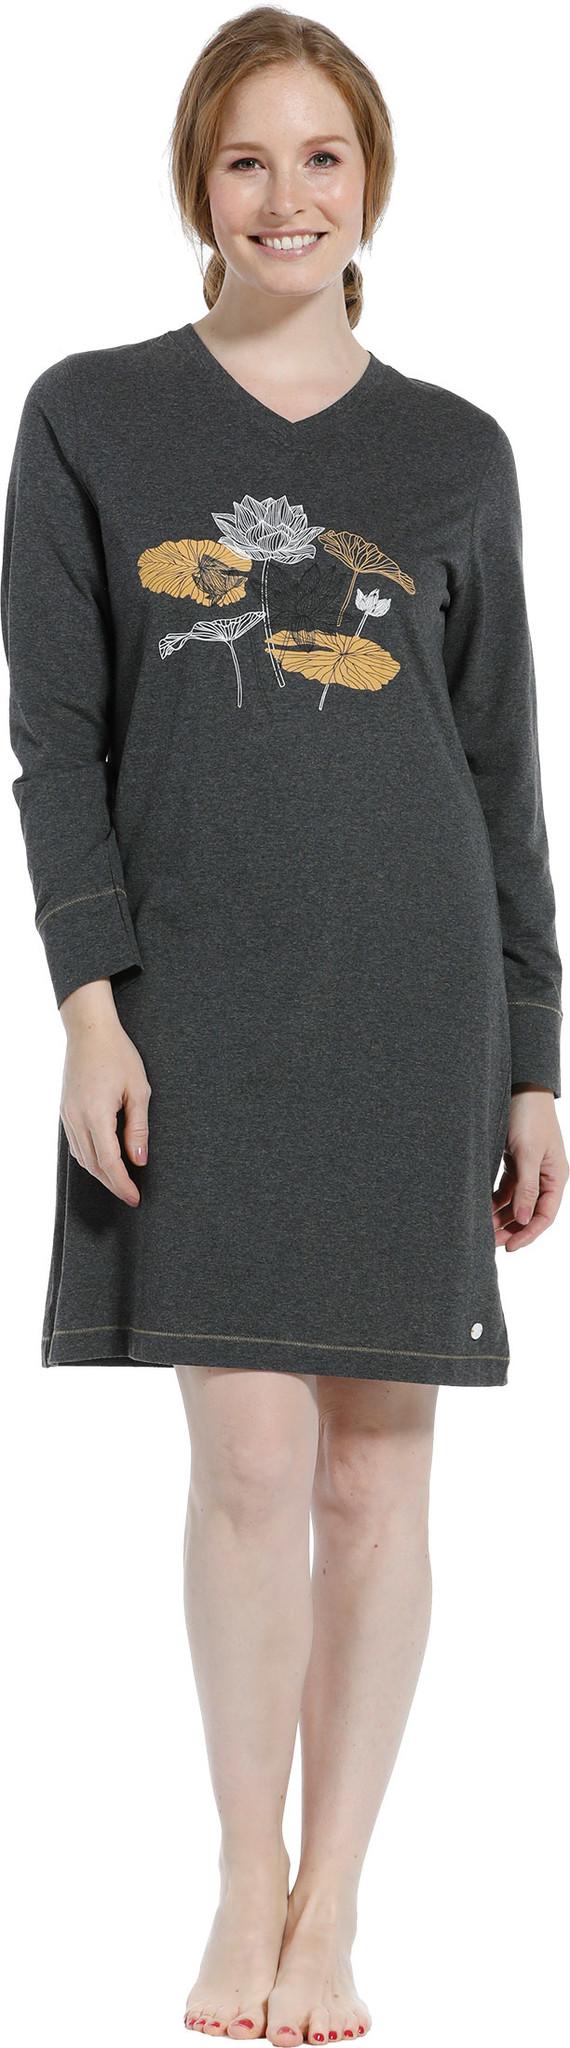 Pastunette dames nachthemd L/M Cassandra